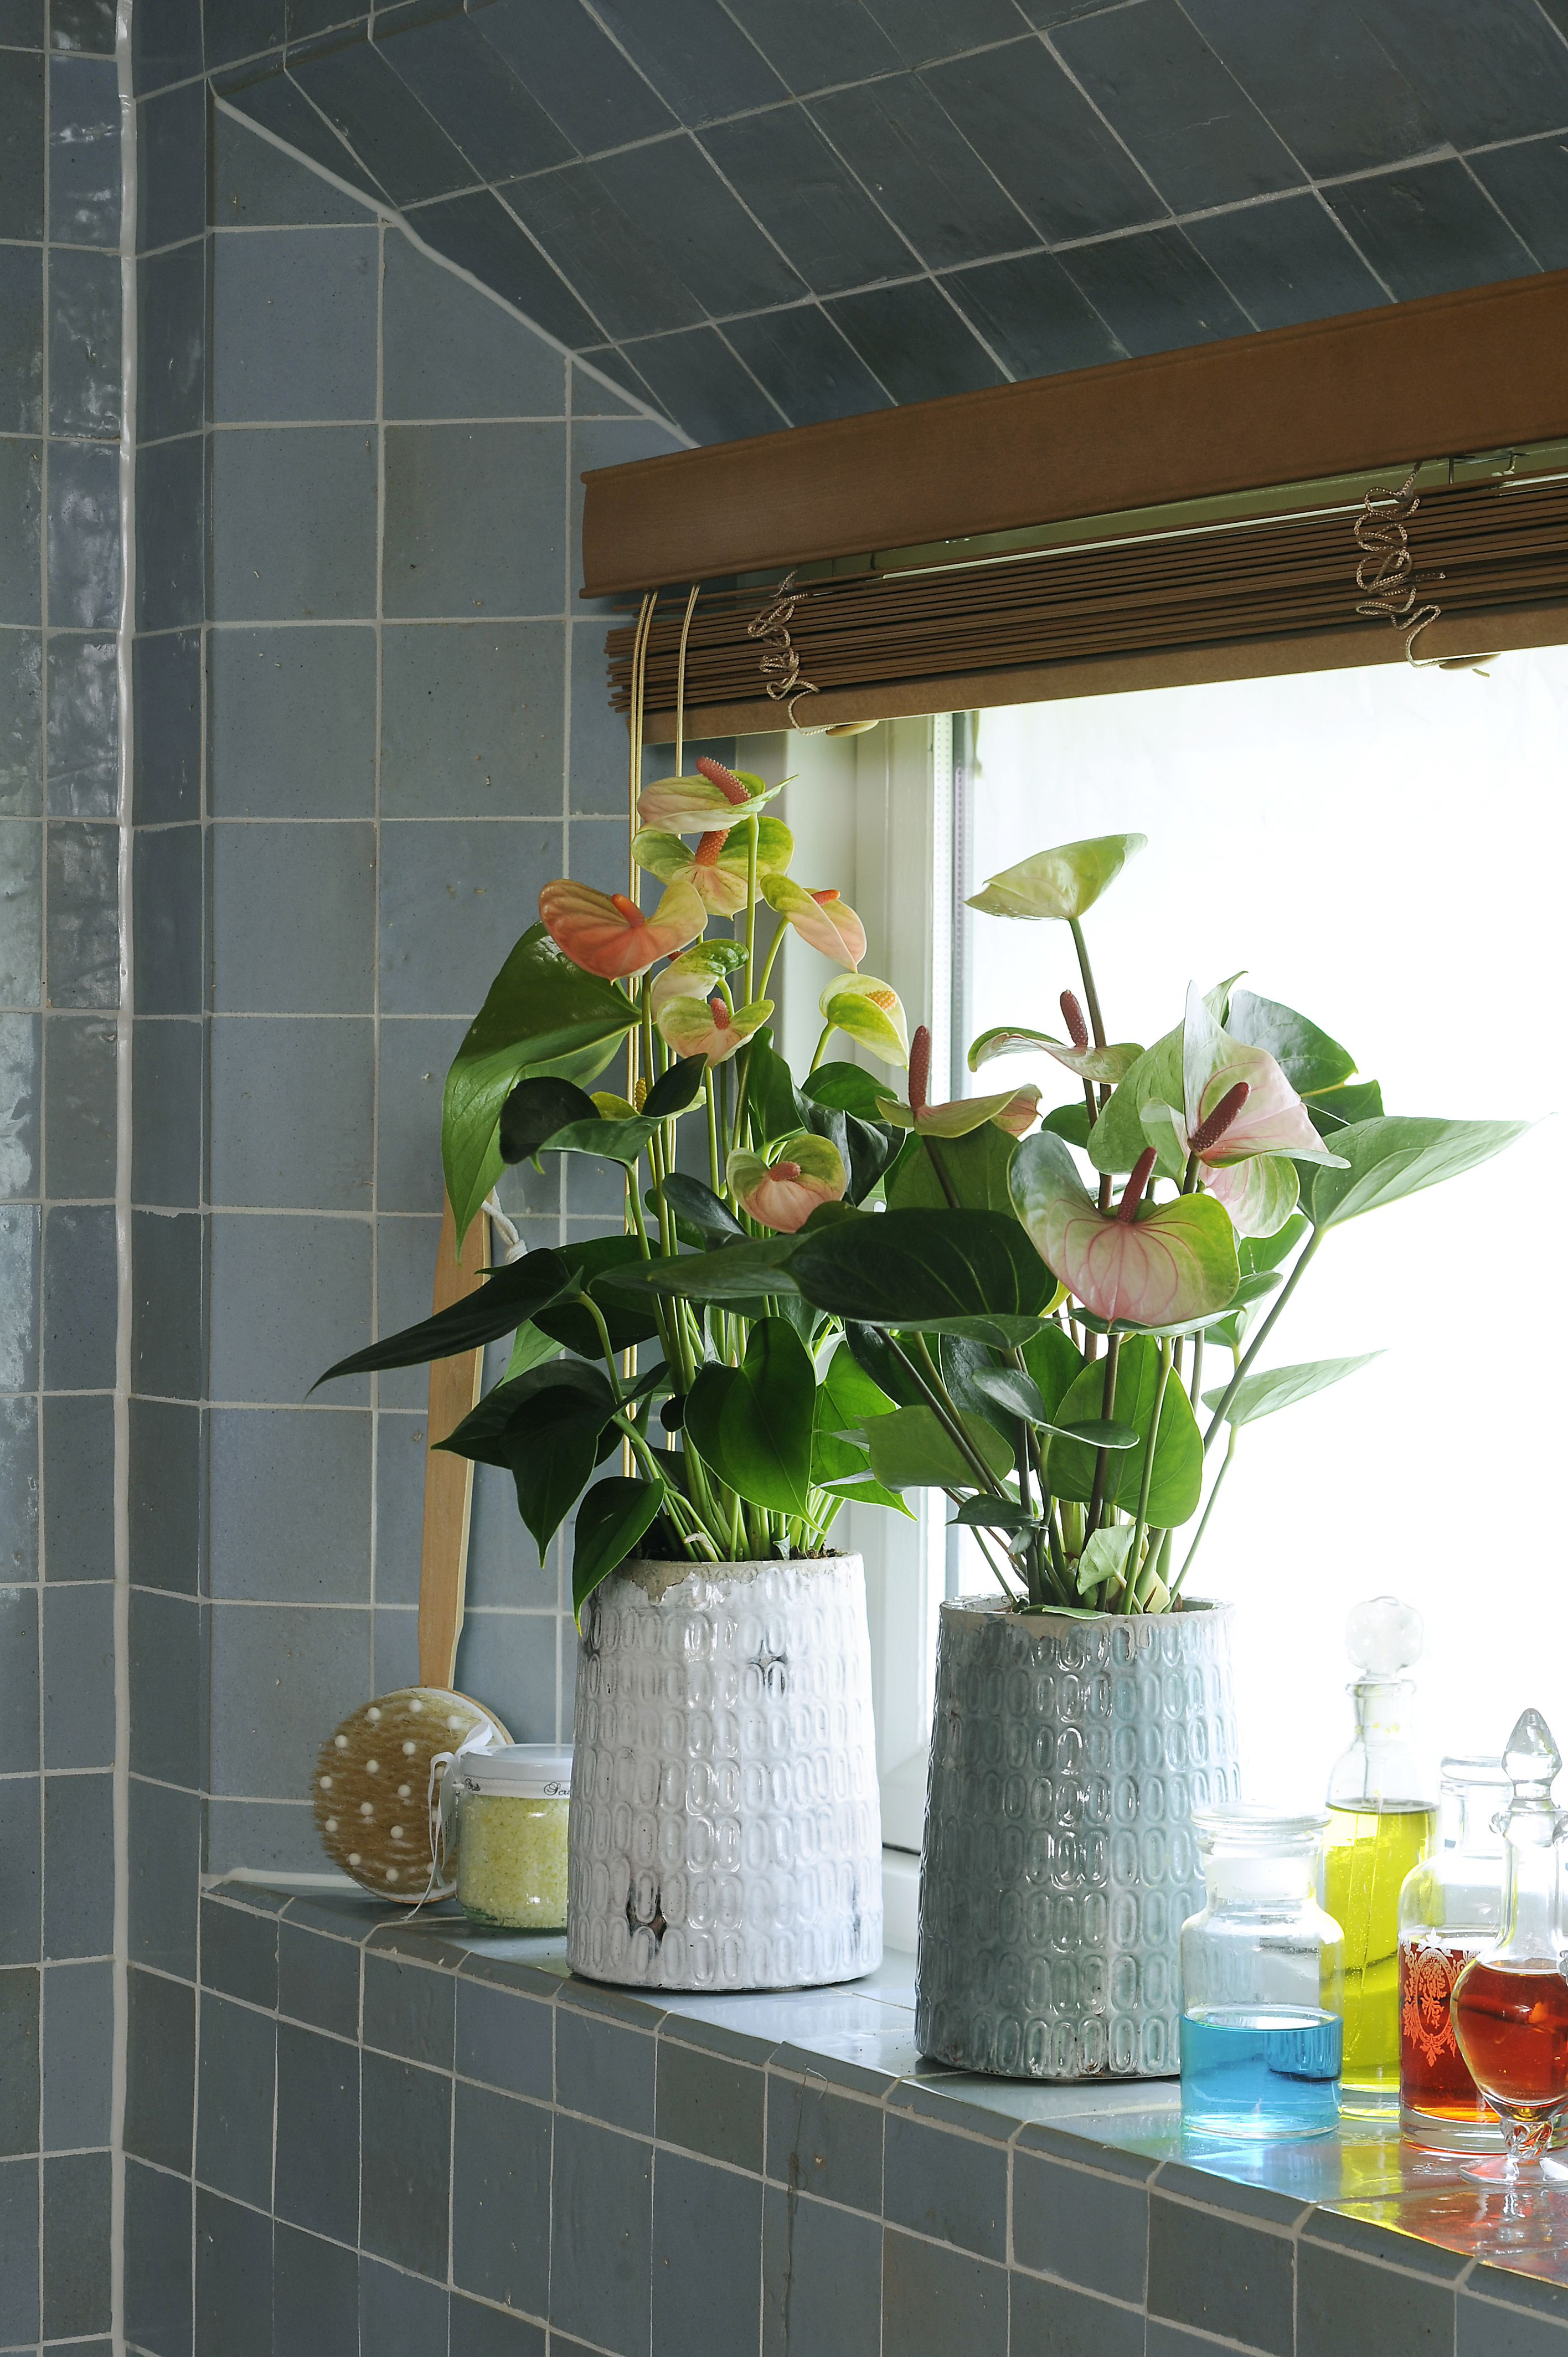 anthurium anthuriuminfo anthurium interieur pinterest gardens. Black Bedroom Furniture Sets. Home Design Ideas